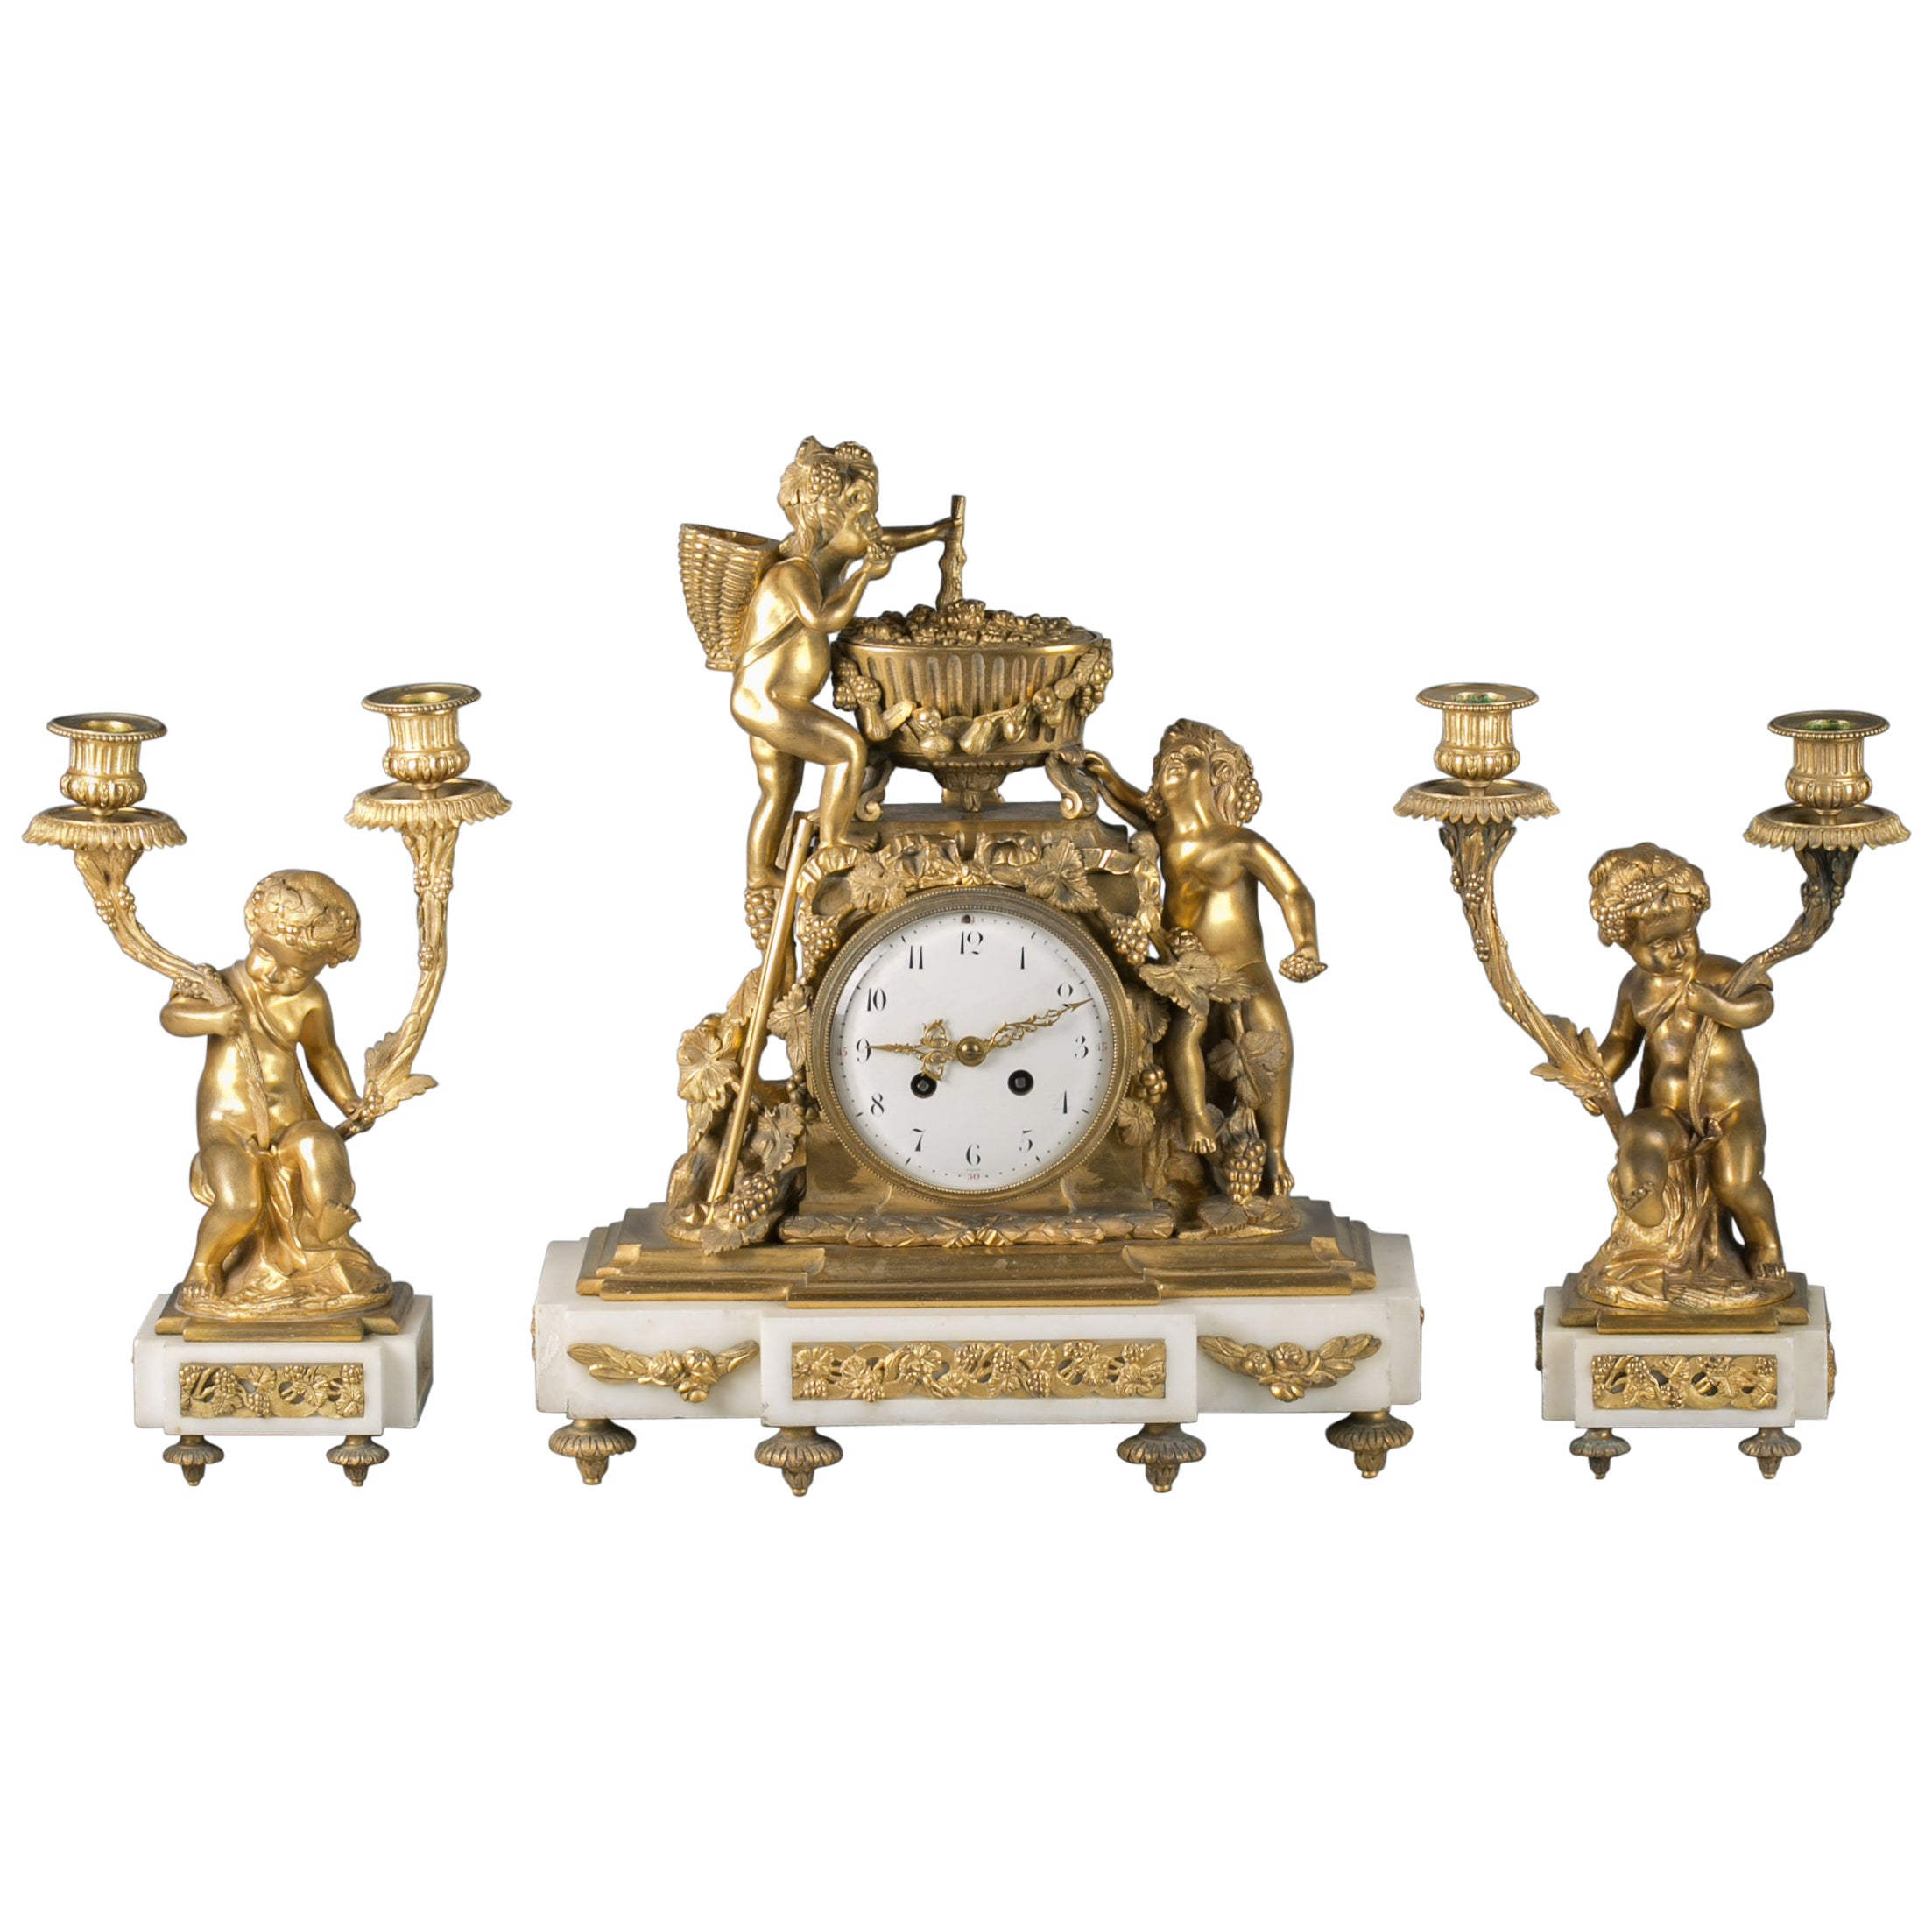 Three Piece French Bronze and Marble Clock Garniture, circa 1875